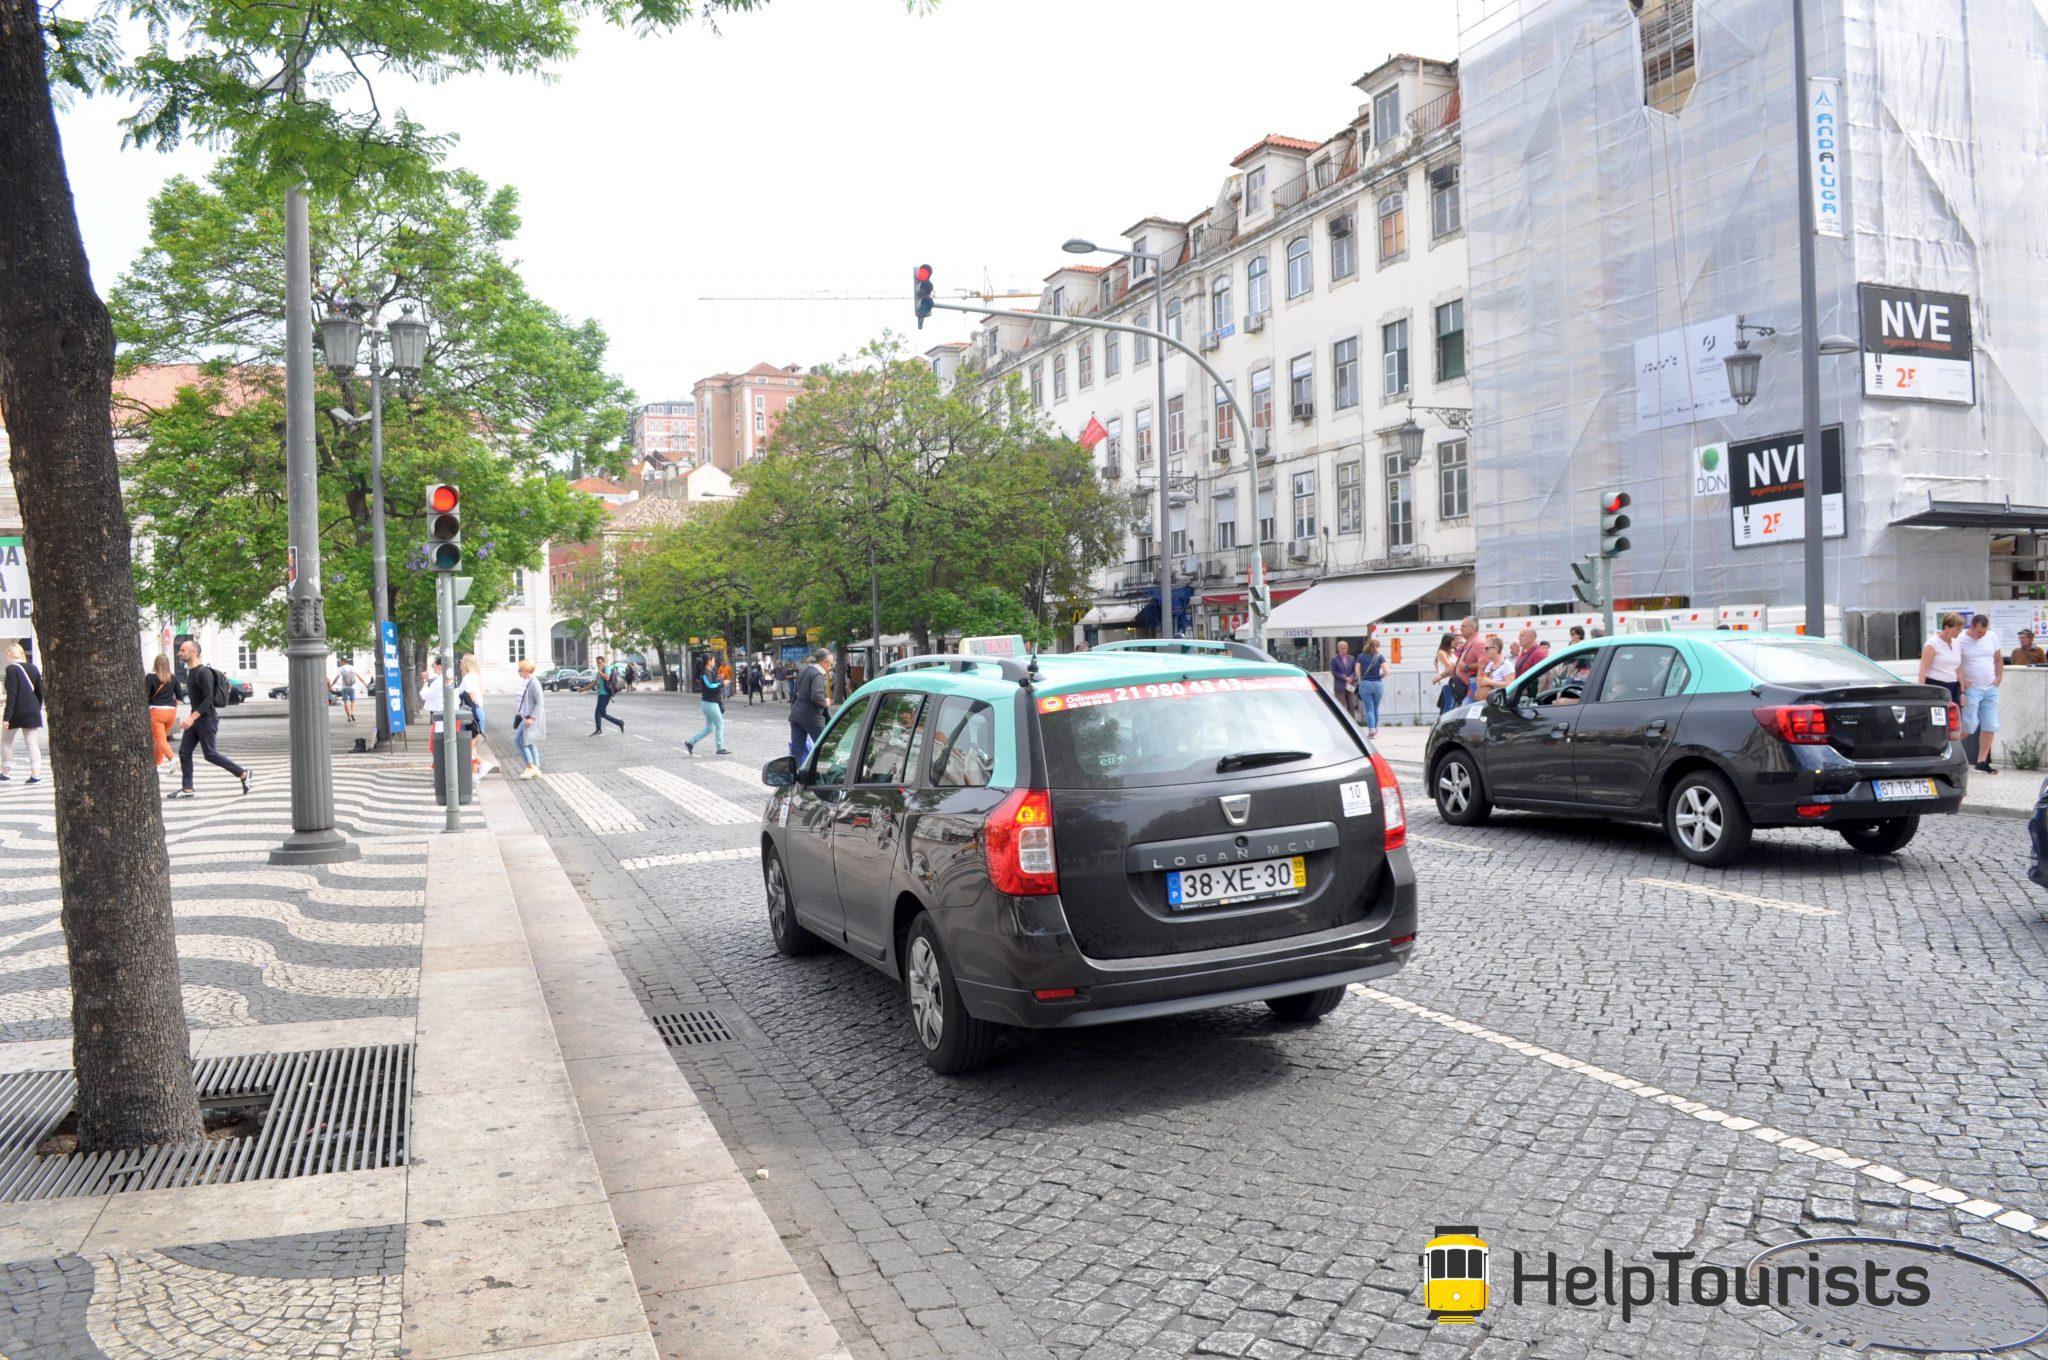 Lissabon Taxi